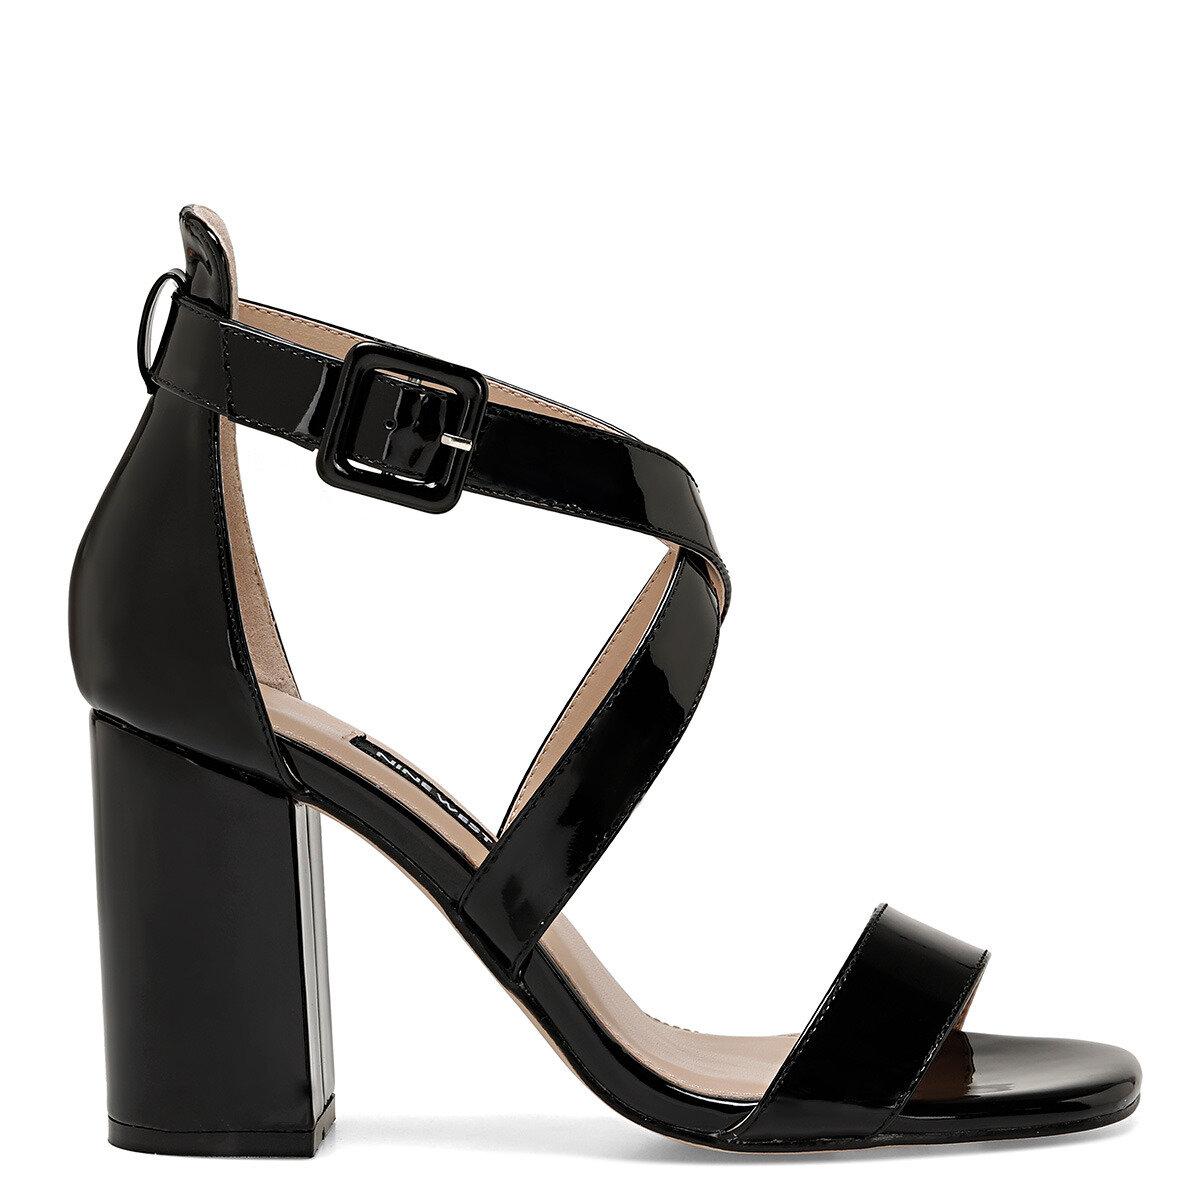 LAURA Siyah Kadın Topuklu Ayakkabı